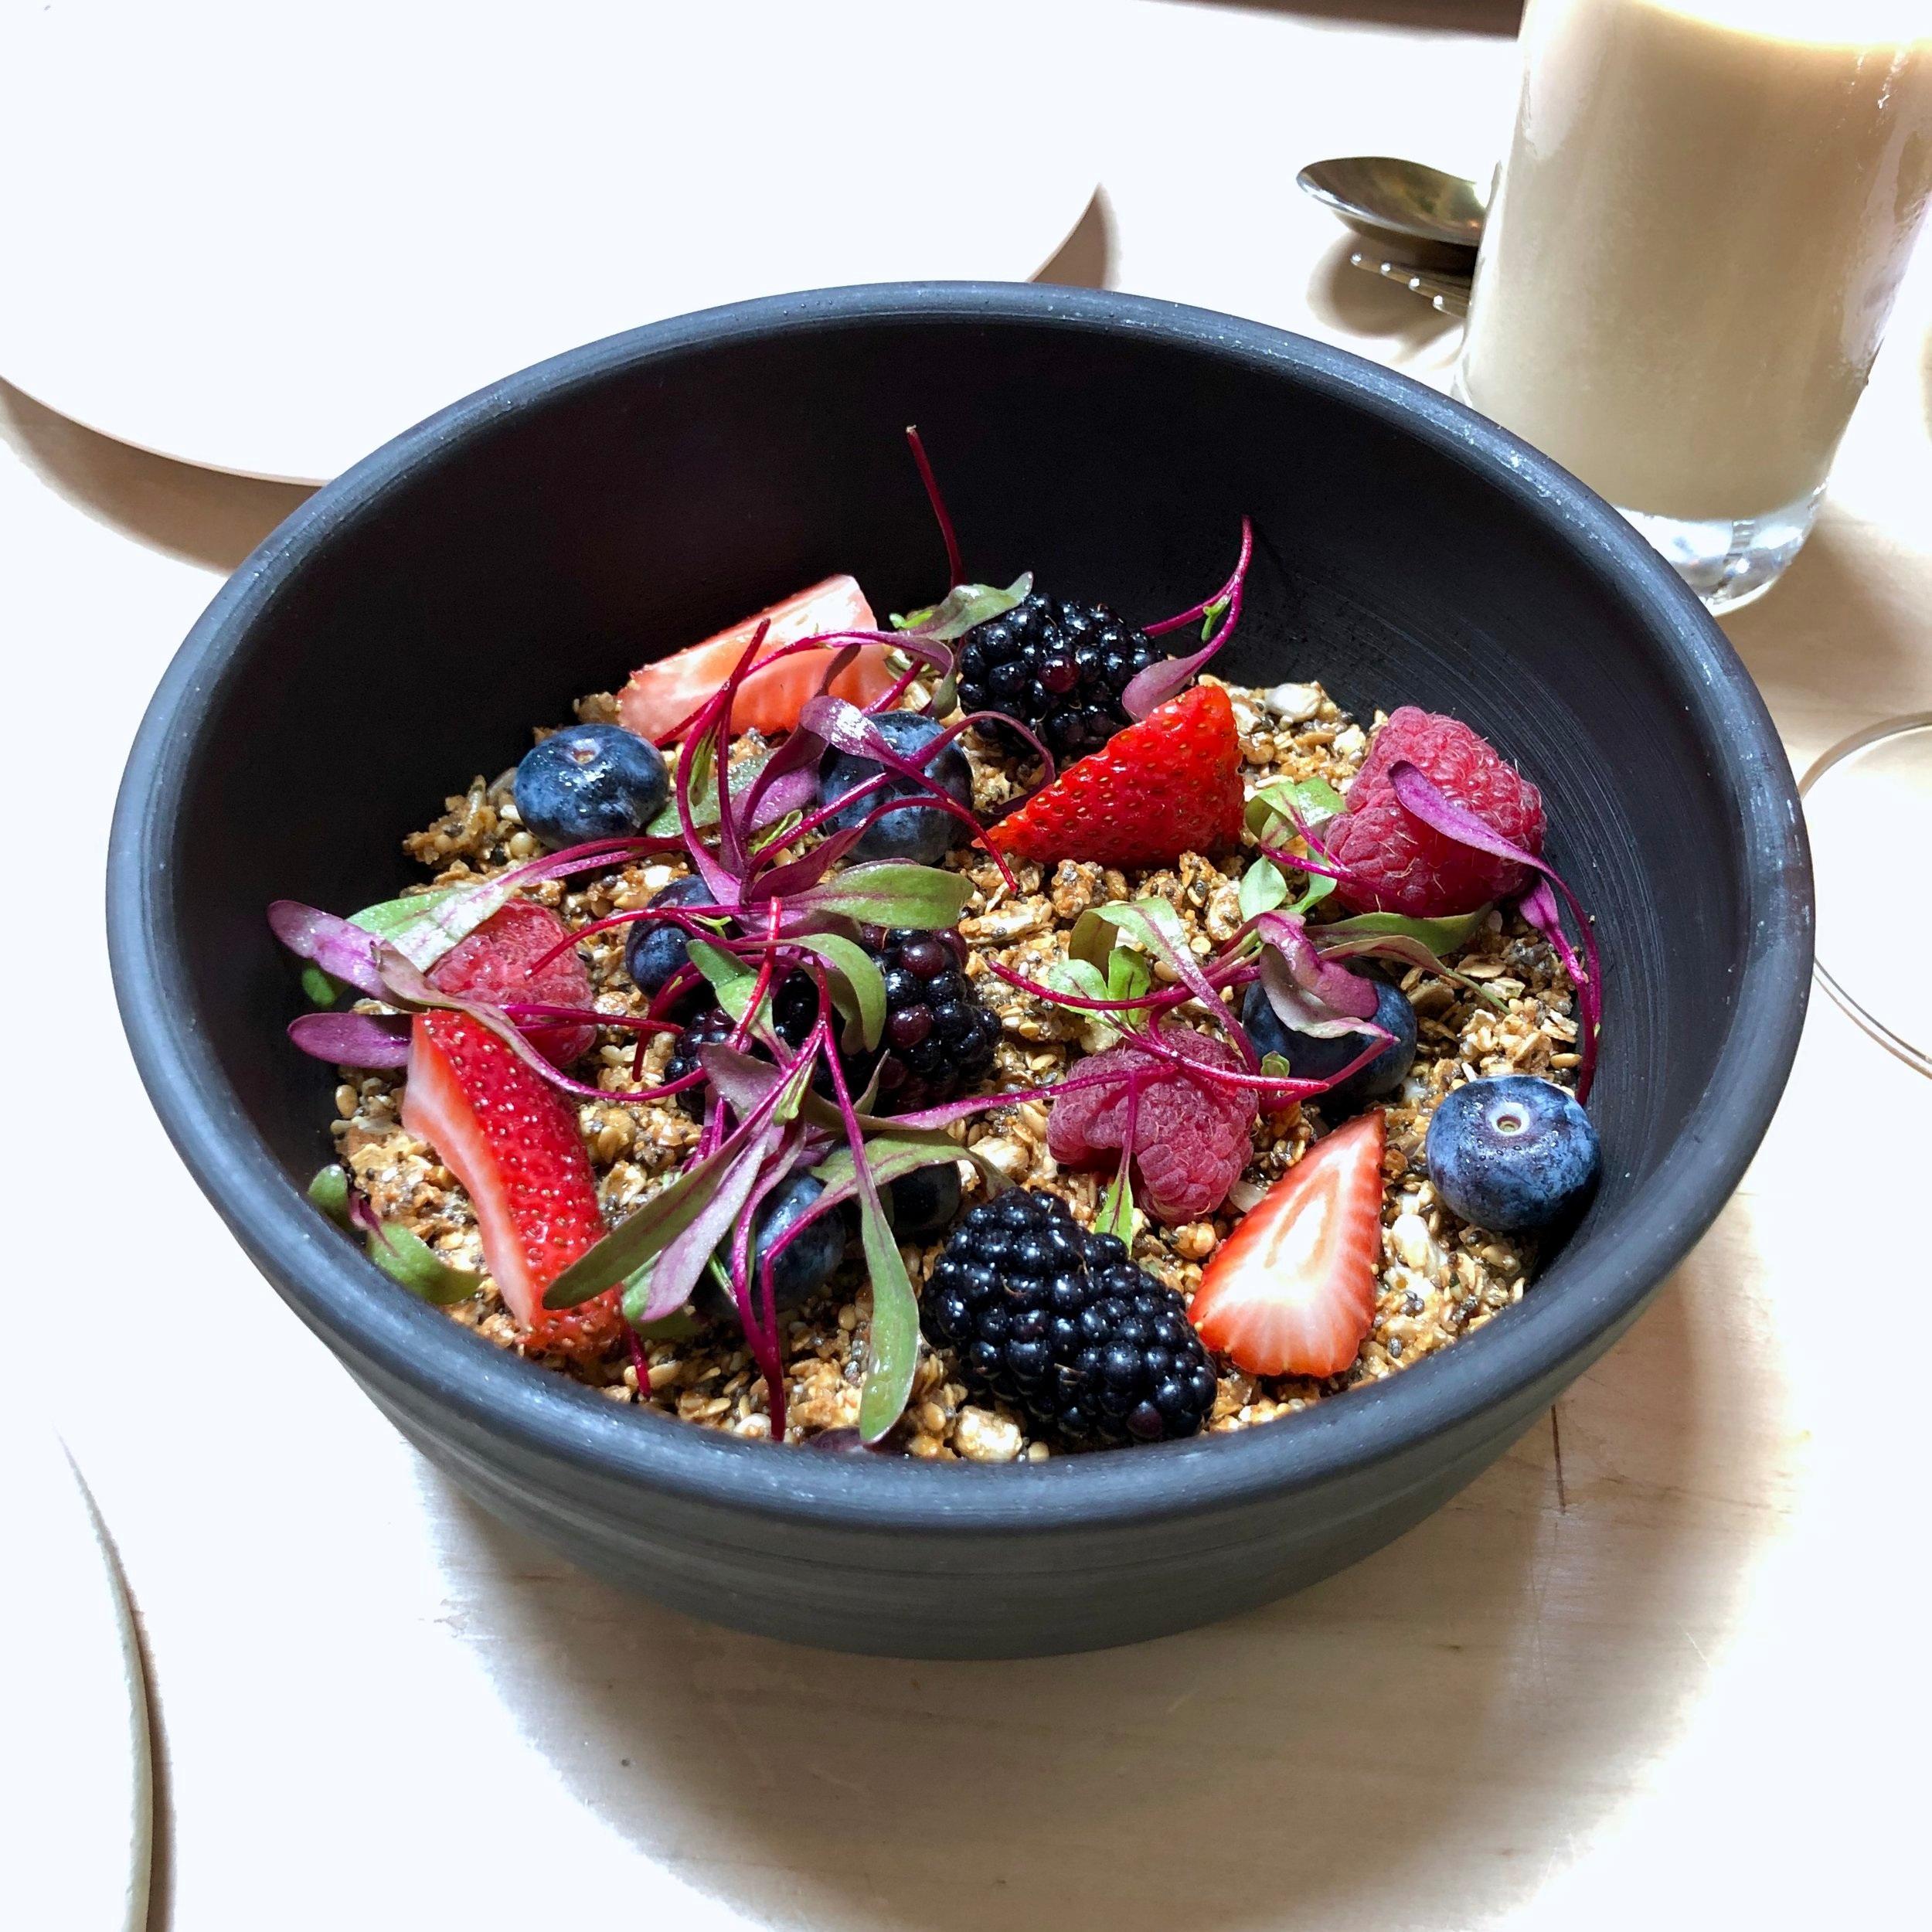 seeded maple granola // coconut yogurt, market berries & herbs